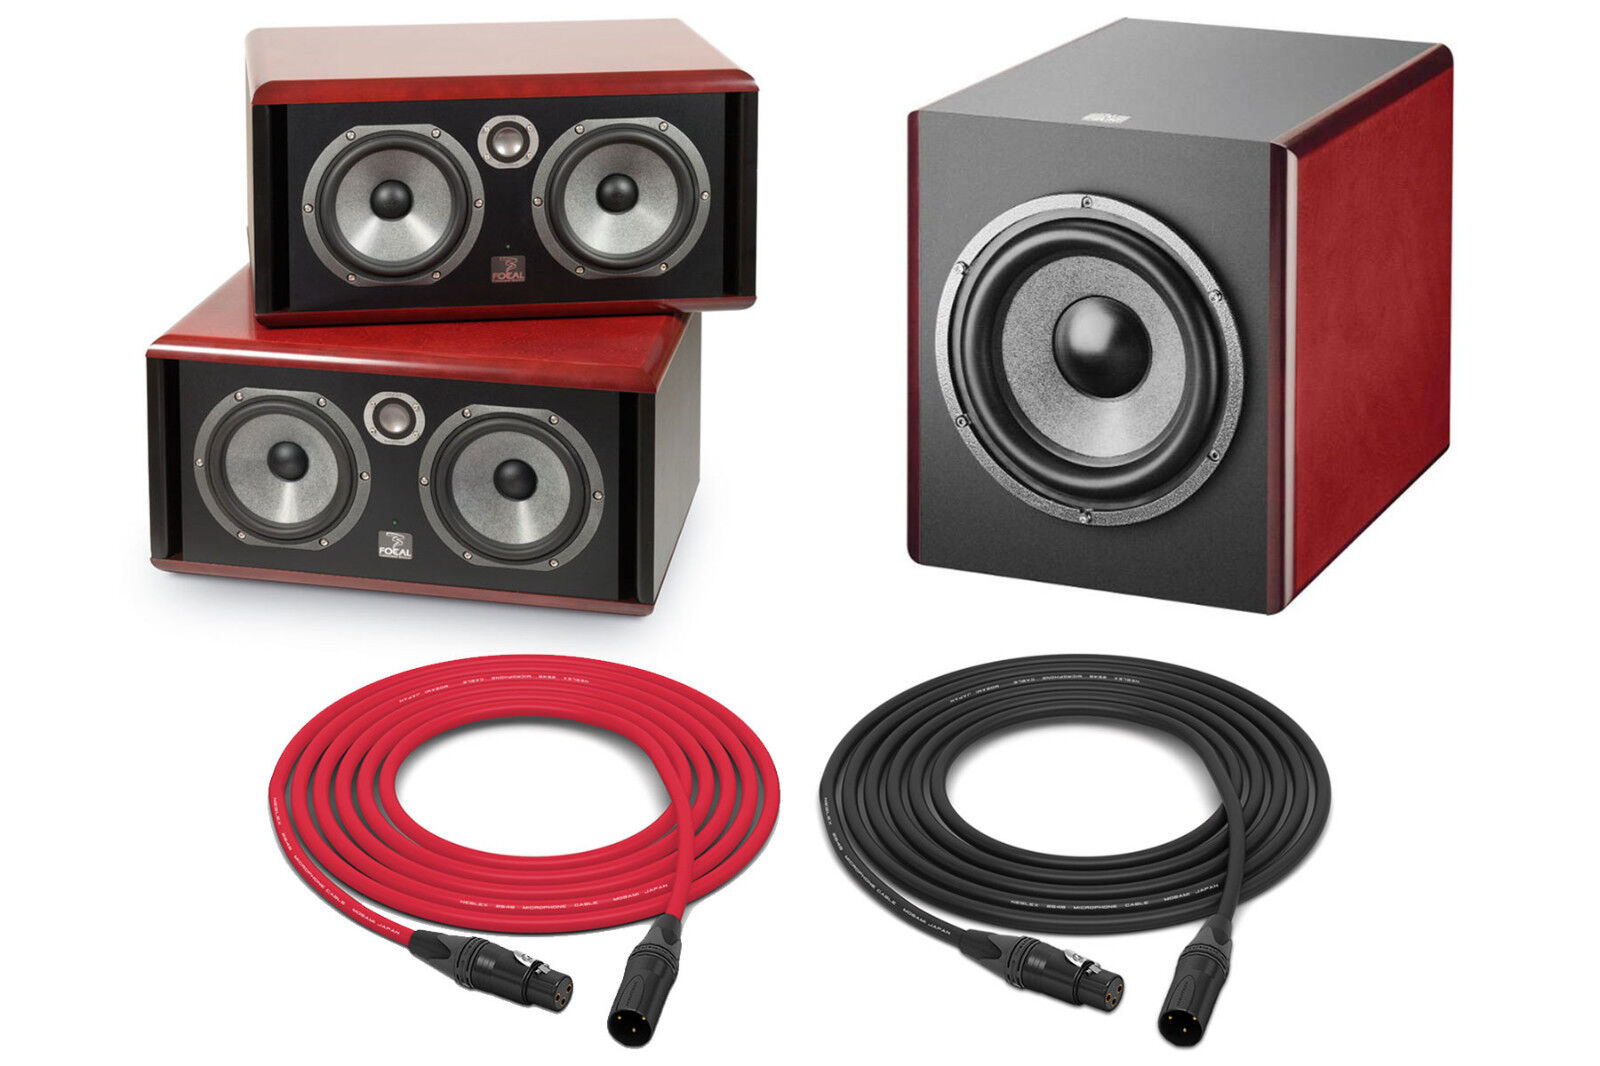 focal twin6 be sub6 monitor set pro audio la ebay. Black Bedroom Furniture Sets. Home Design Ideas